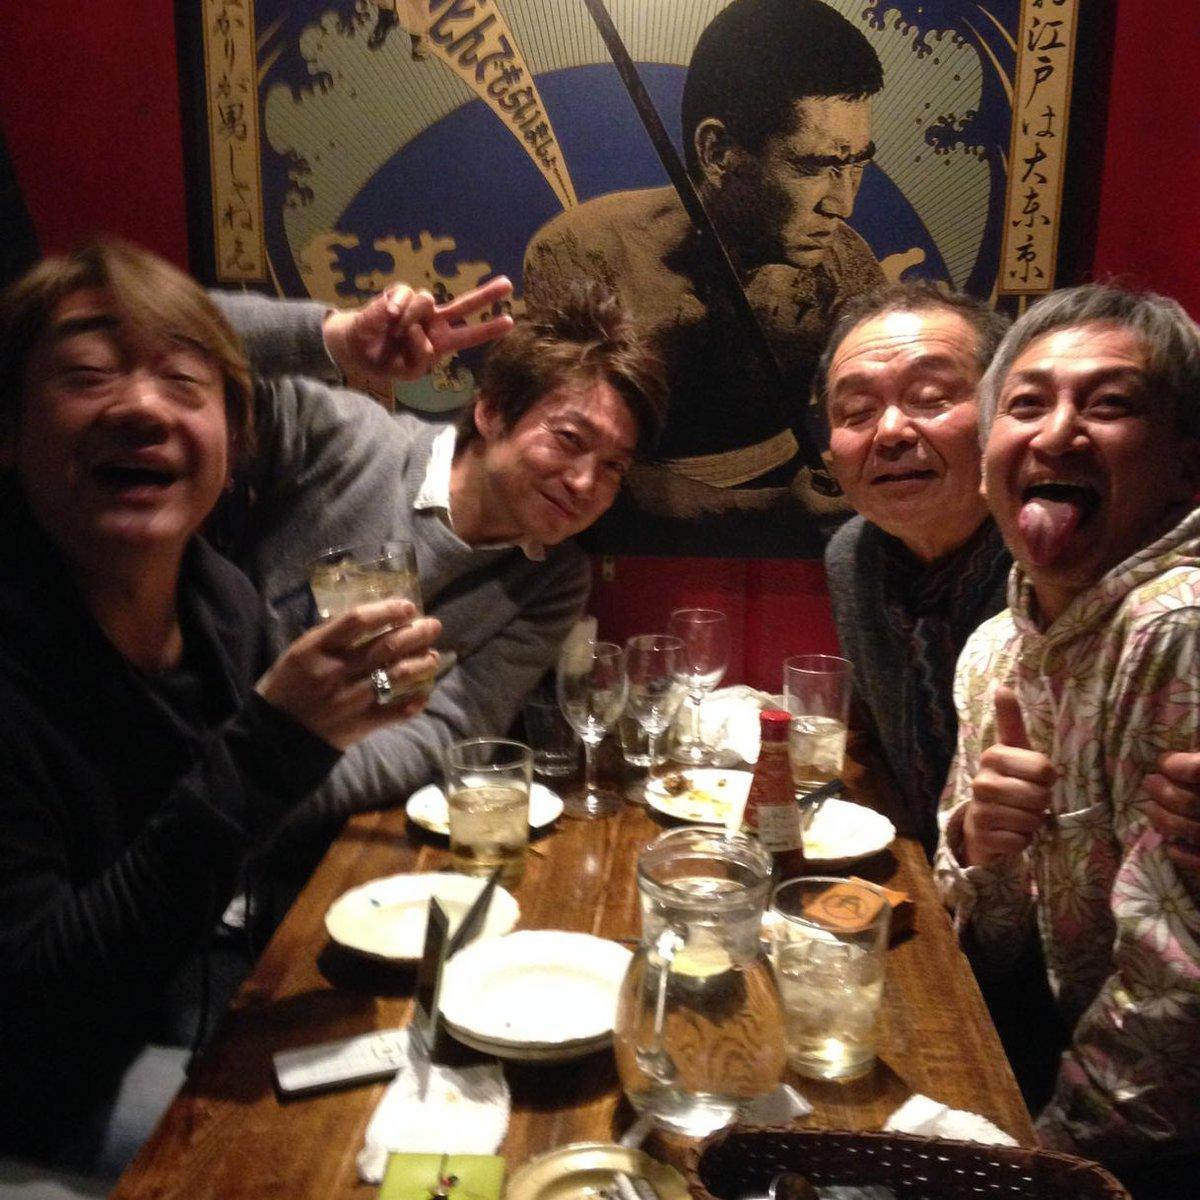 THE GOOD-BYE新年会やってます! 10枚目のアルバムのレコーディングの話も・・・ 乞うご期待!! https://t.co/vO3BAmnHxf